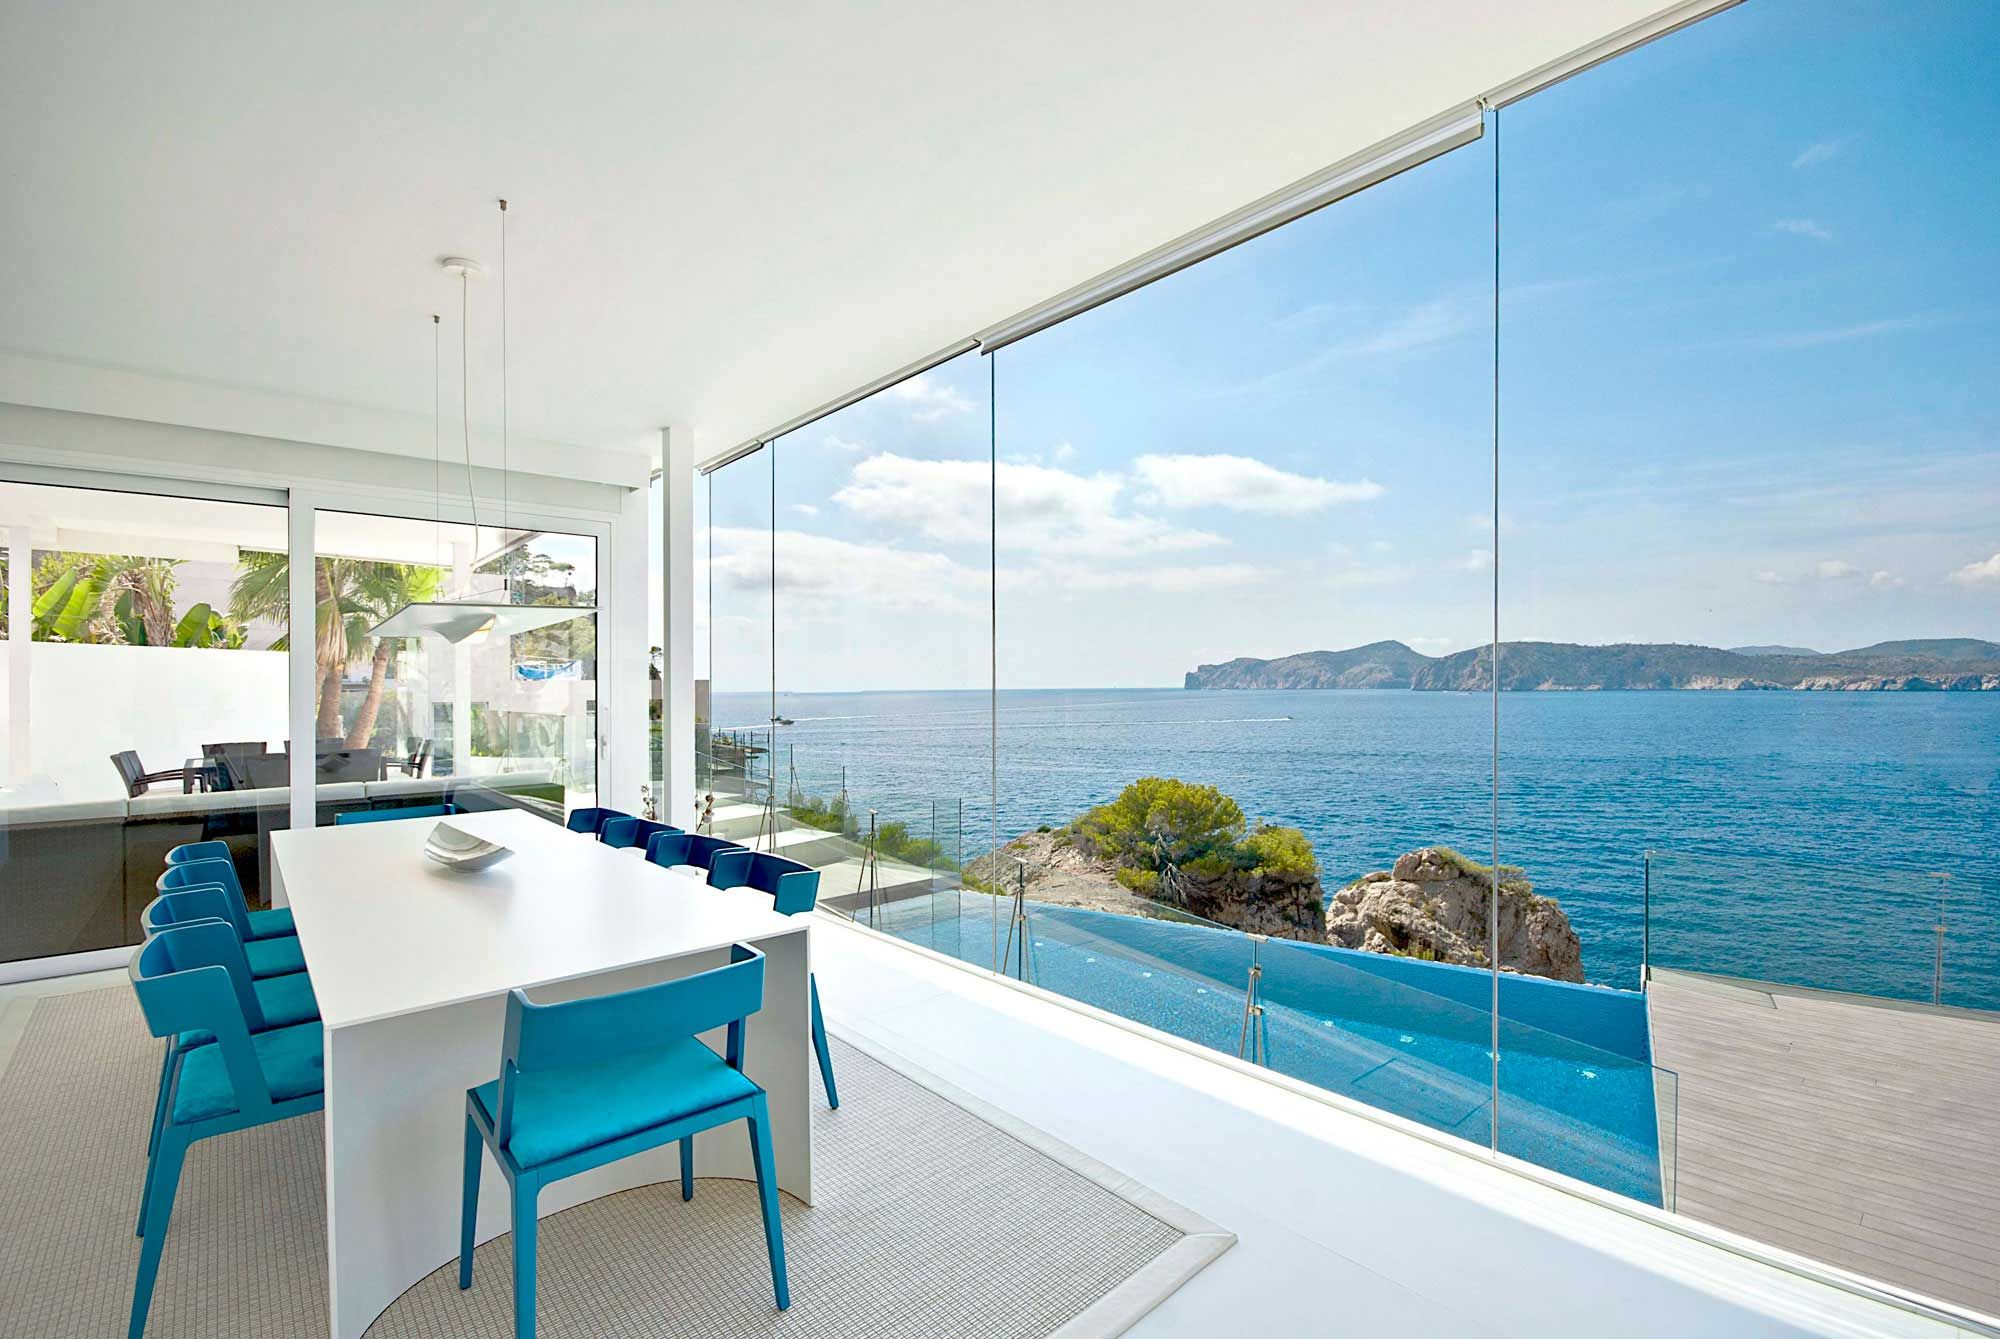 Stunning ultramodern meditetranian villa gold in mallorca http www caandesign